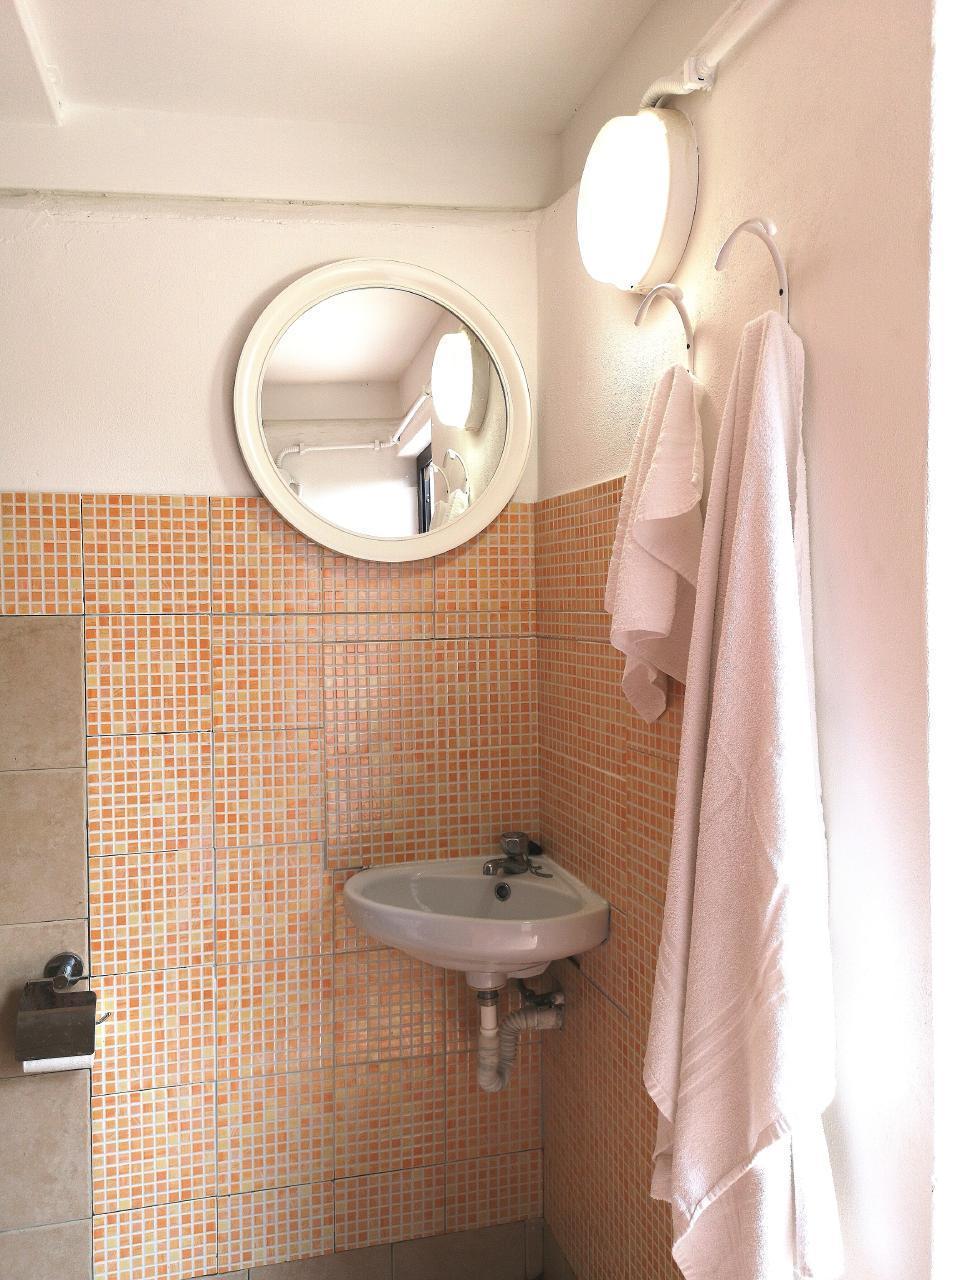 Maison de vacances Costa Mediterranea Ferienhaus (1996572), Cefalù, Palermo, Sicile, Italie, image 26